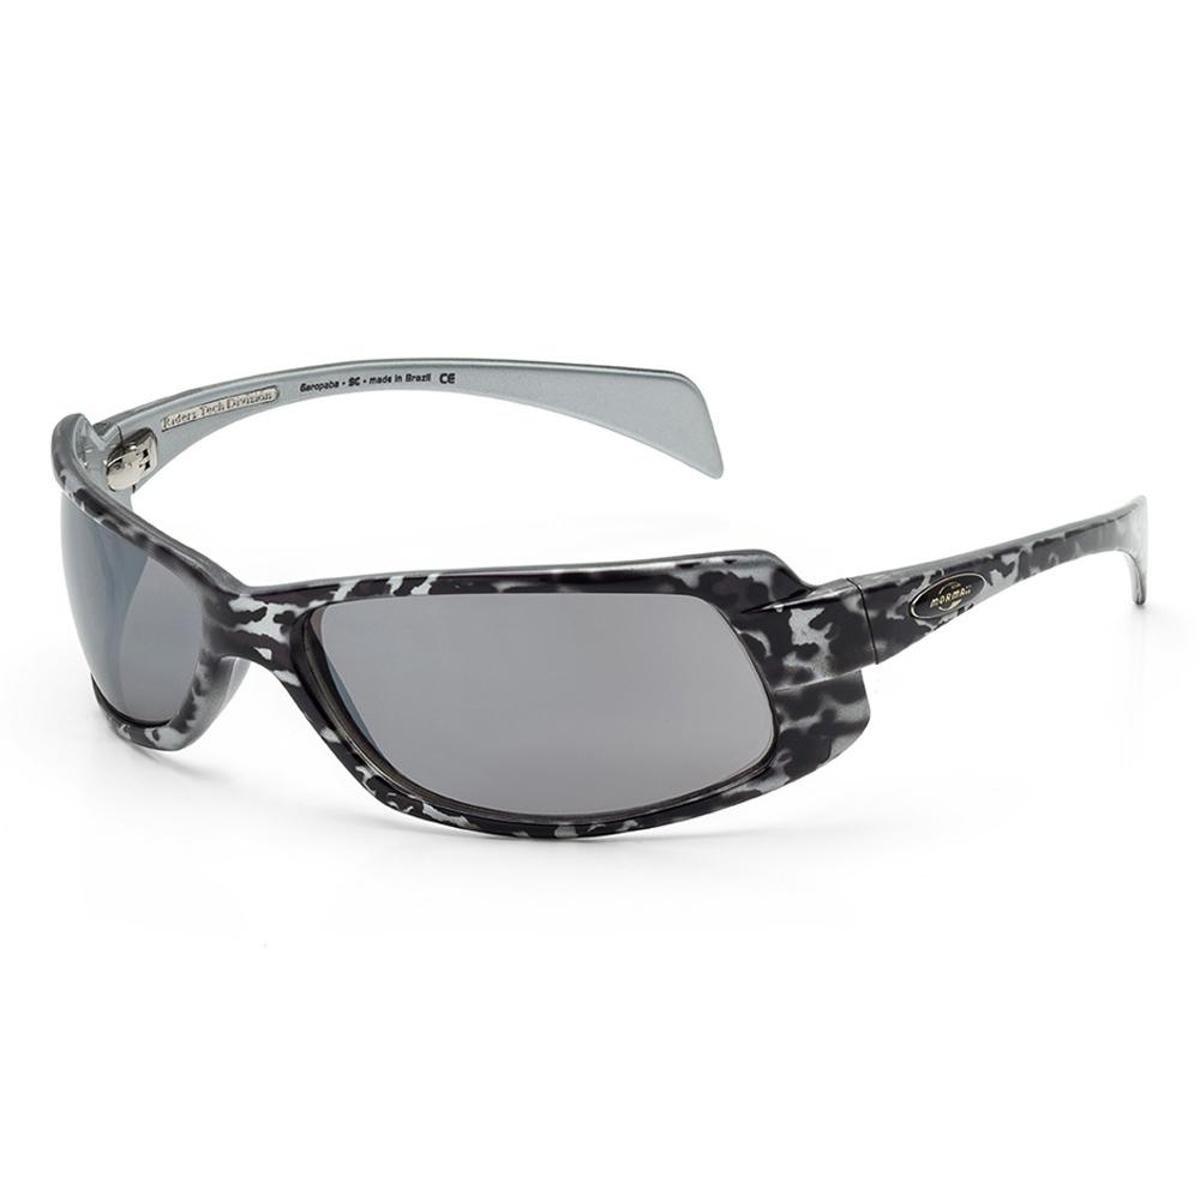 5f4dcb37c536f Óculos Mormaii Gamboa Ro A266 Camuflado - Compre Agora